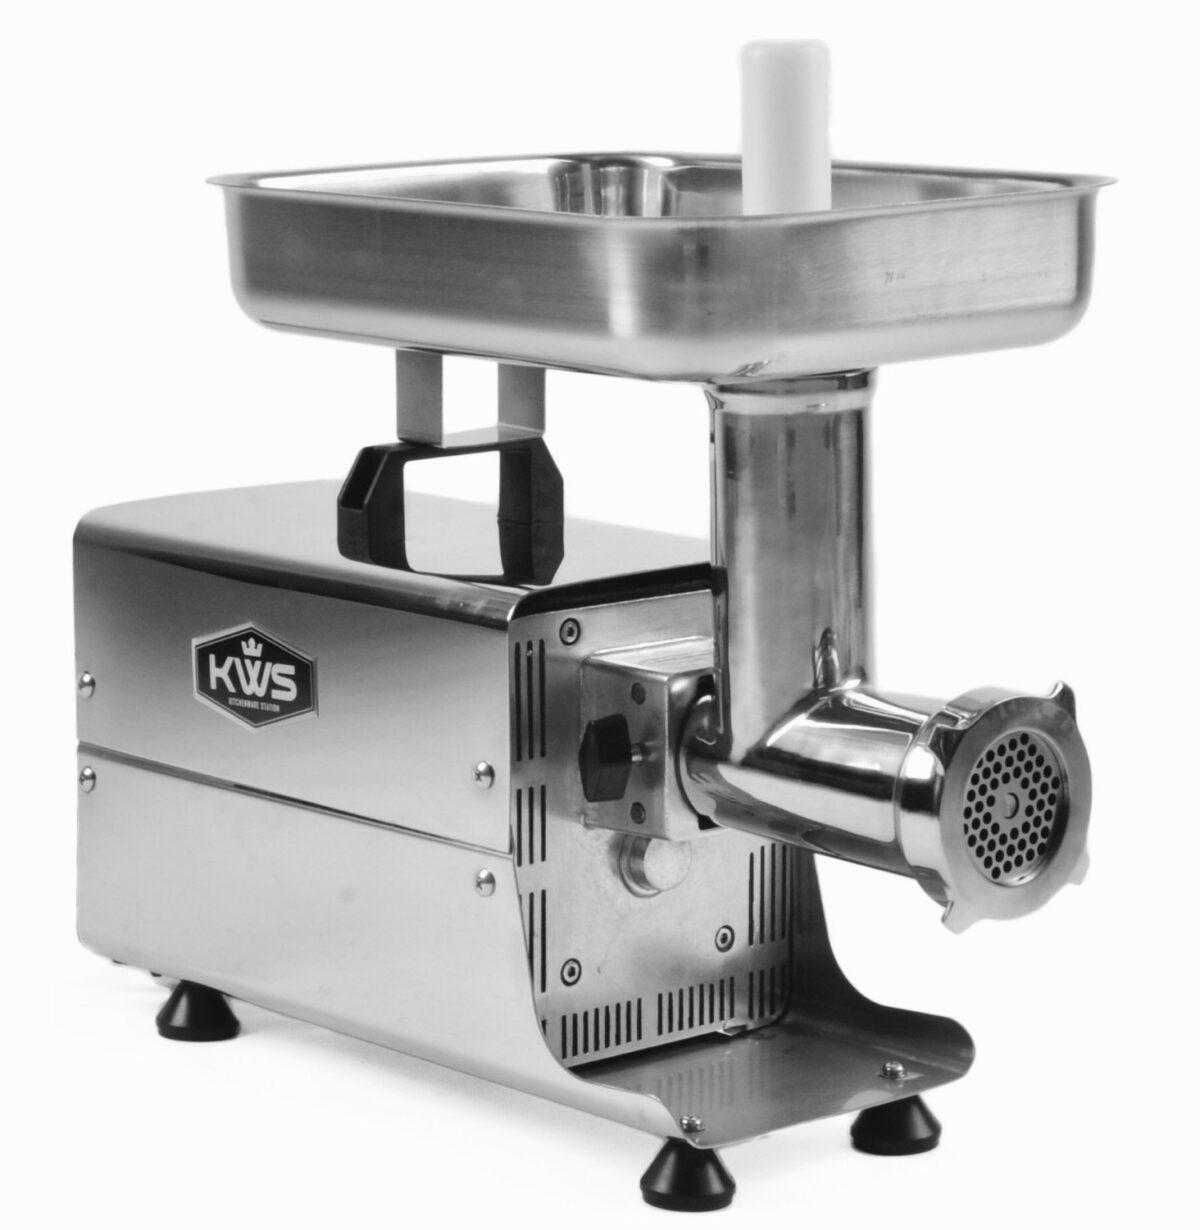 KWS SL-8 Meat grinder